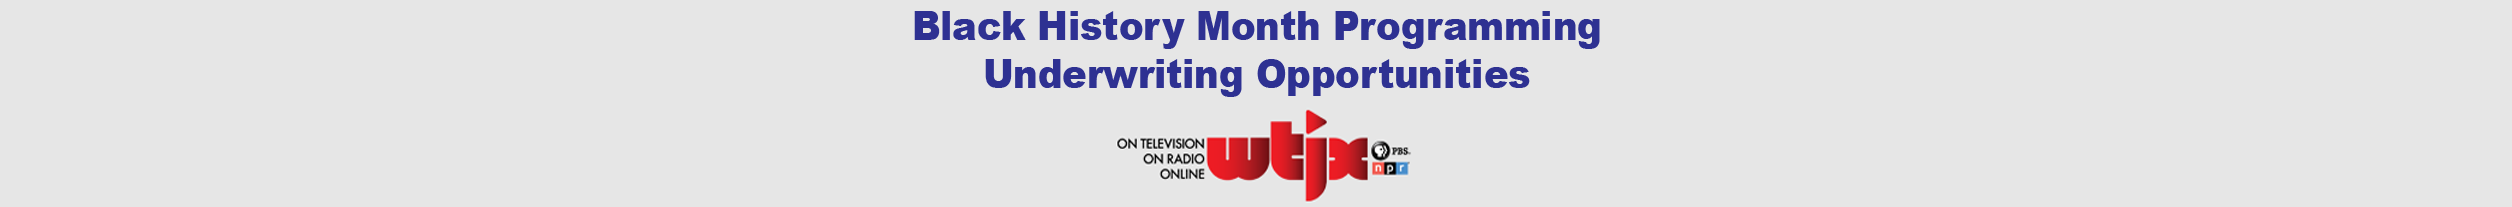 Black History month underwriting